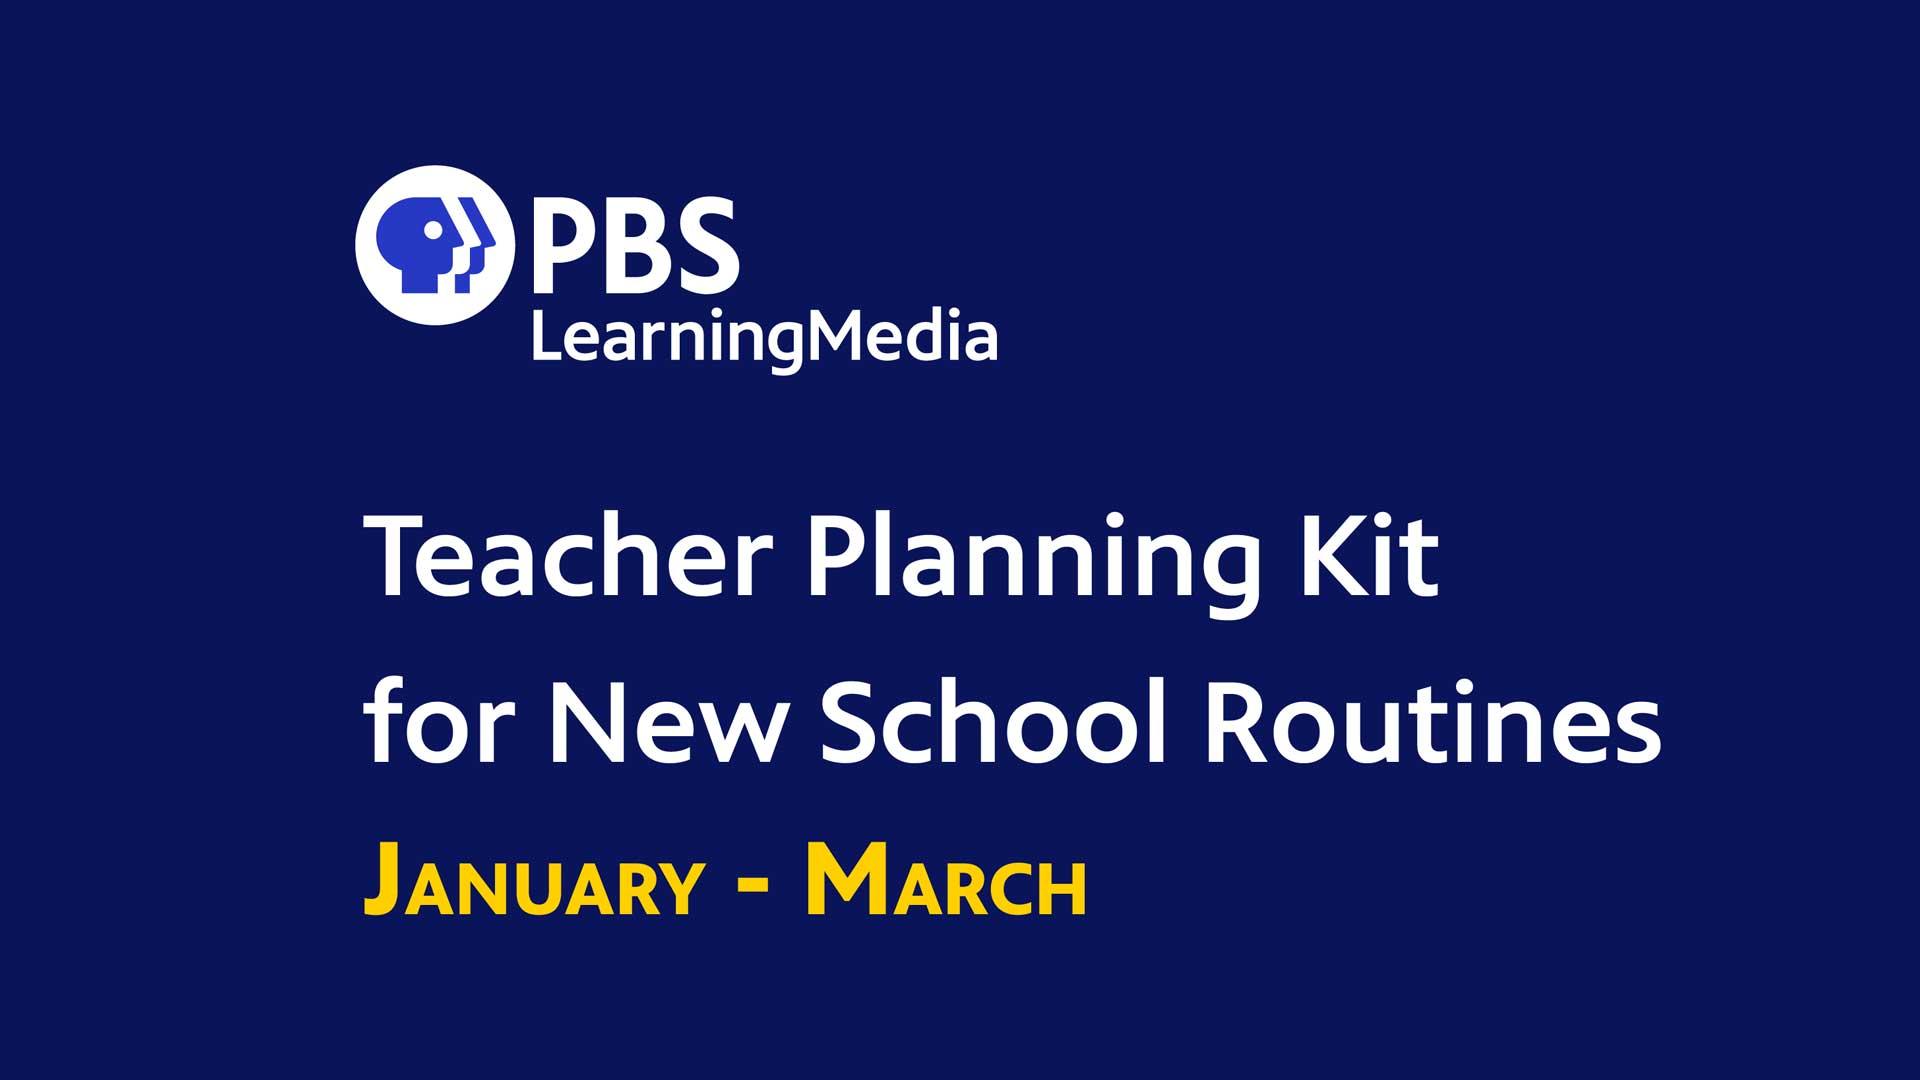 Teacher Planning Kits